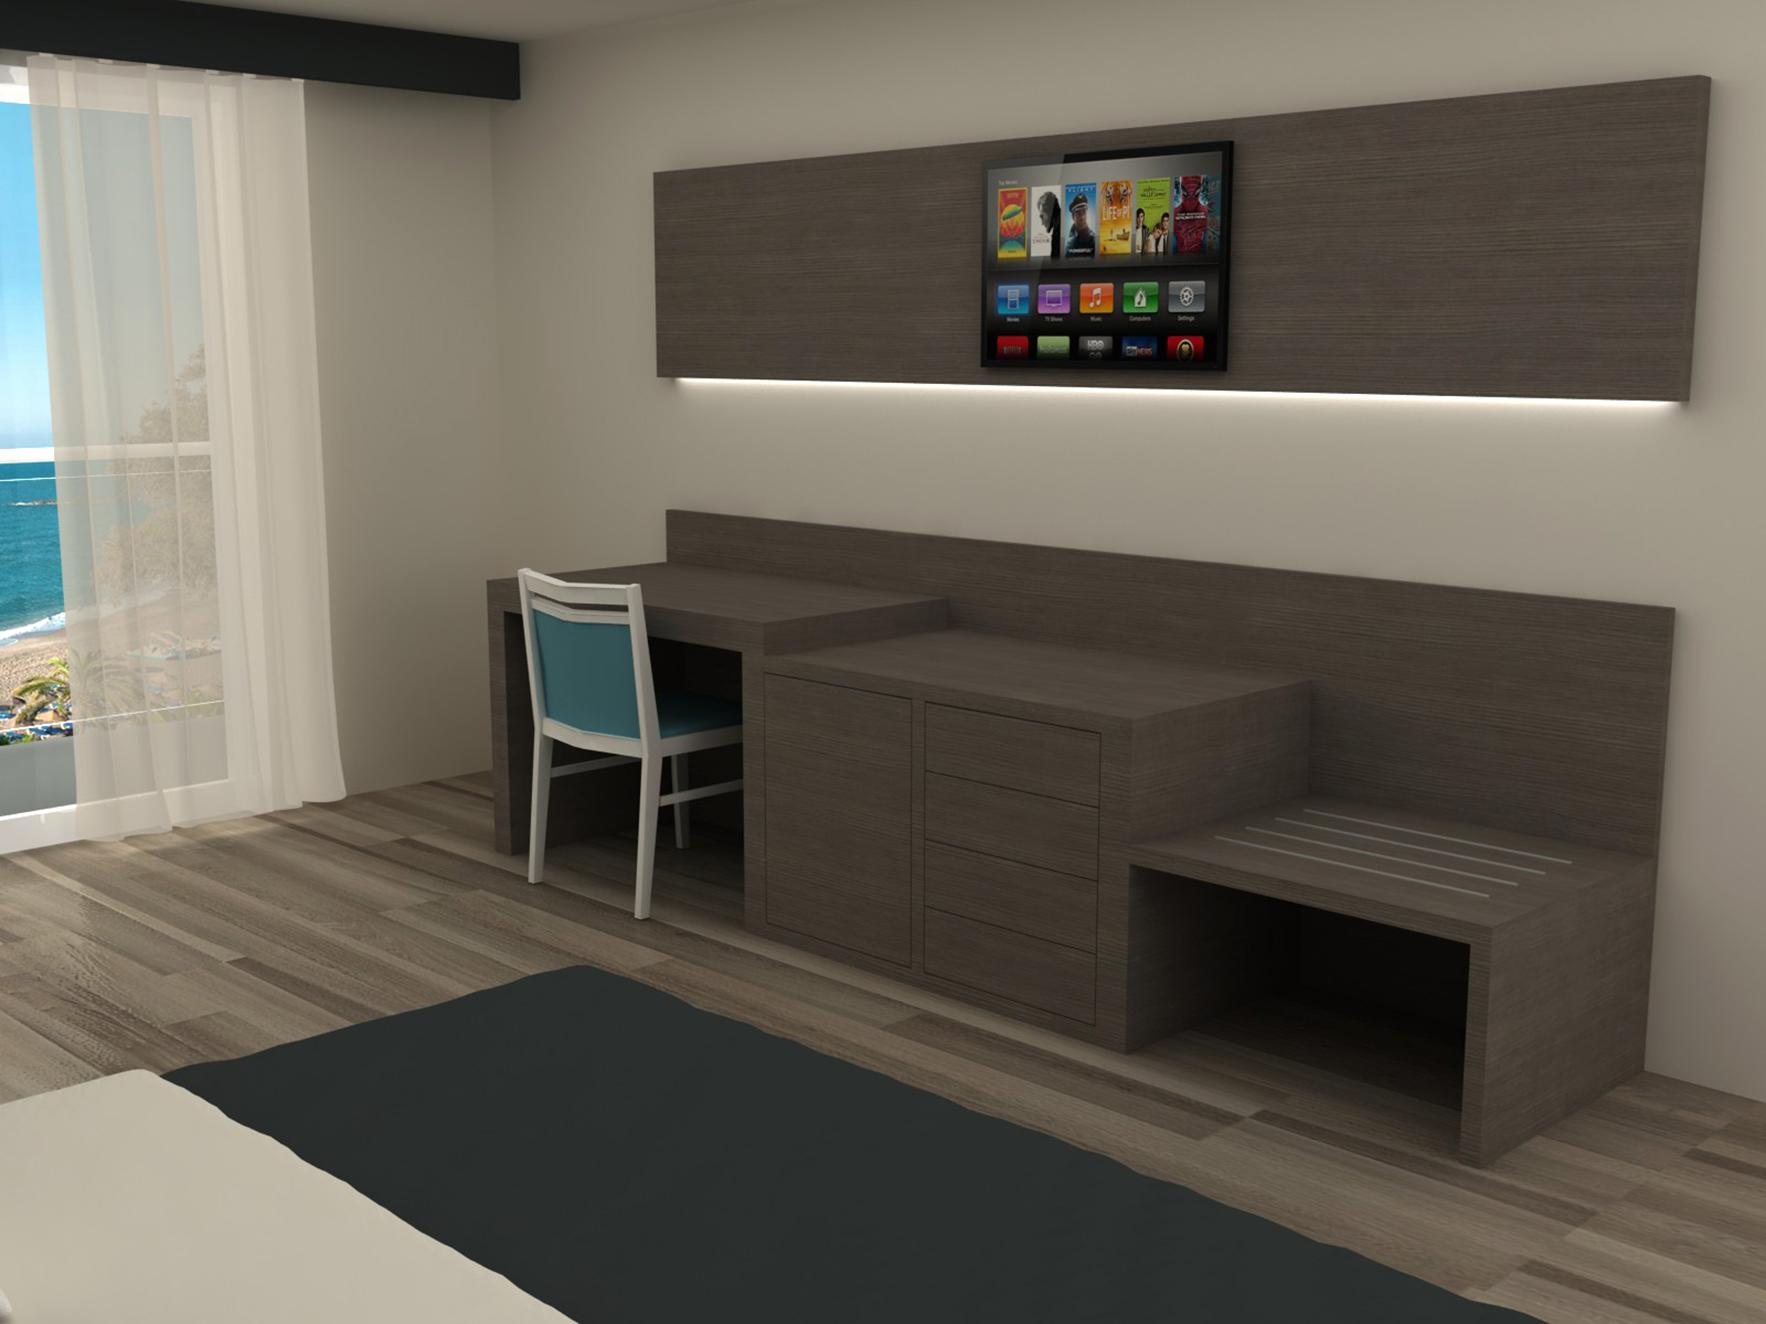 Dormitorio TM615H.11